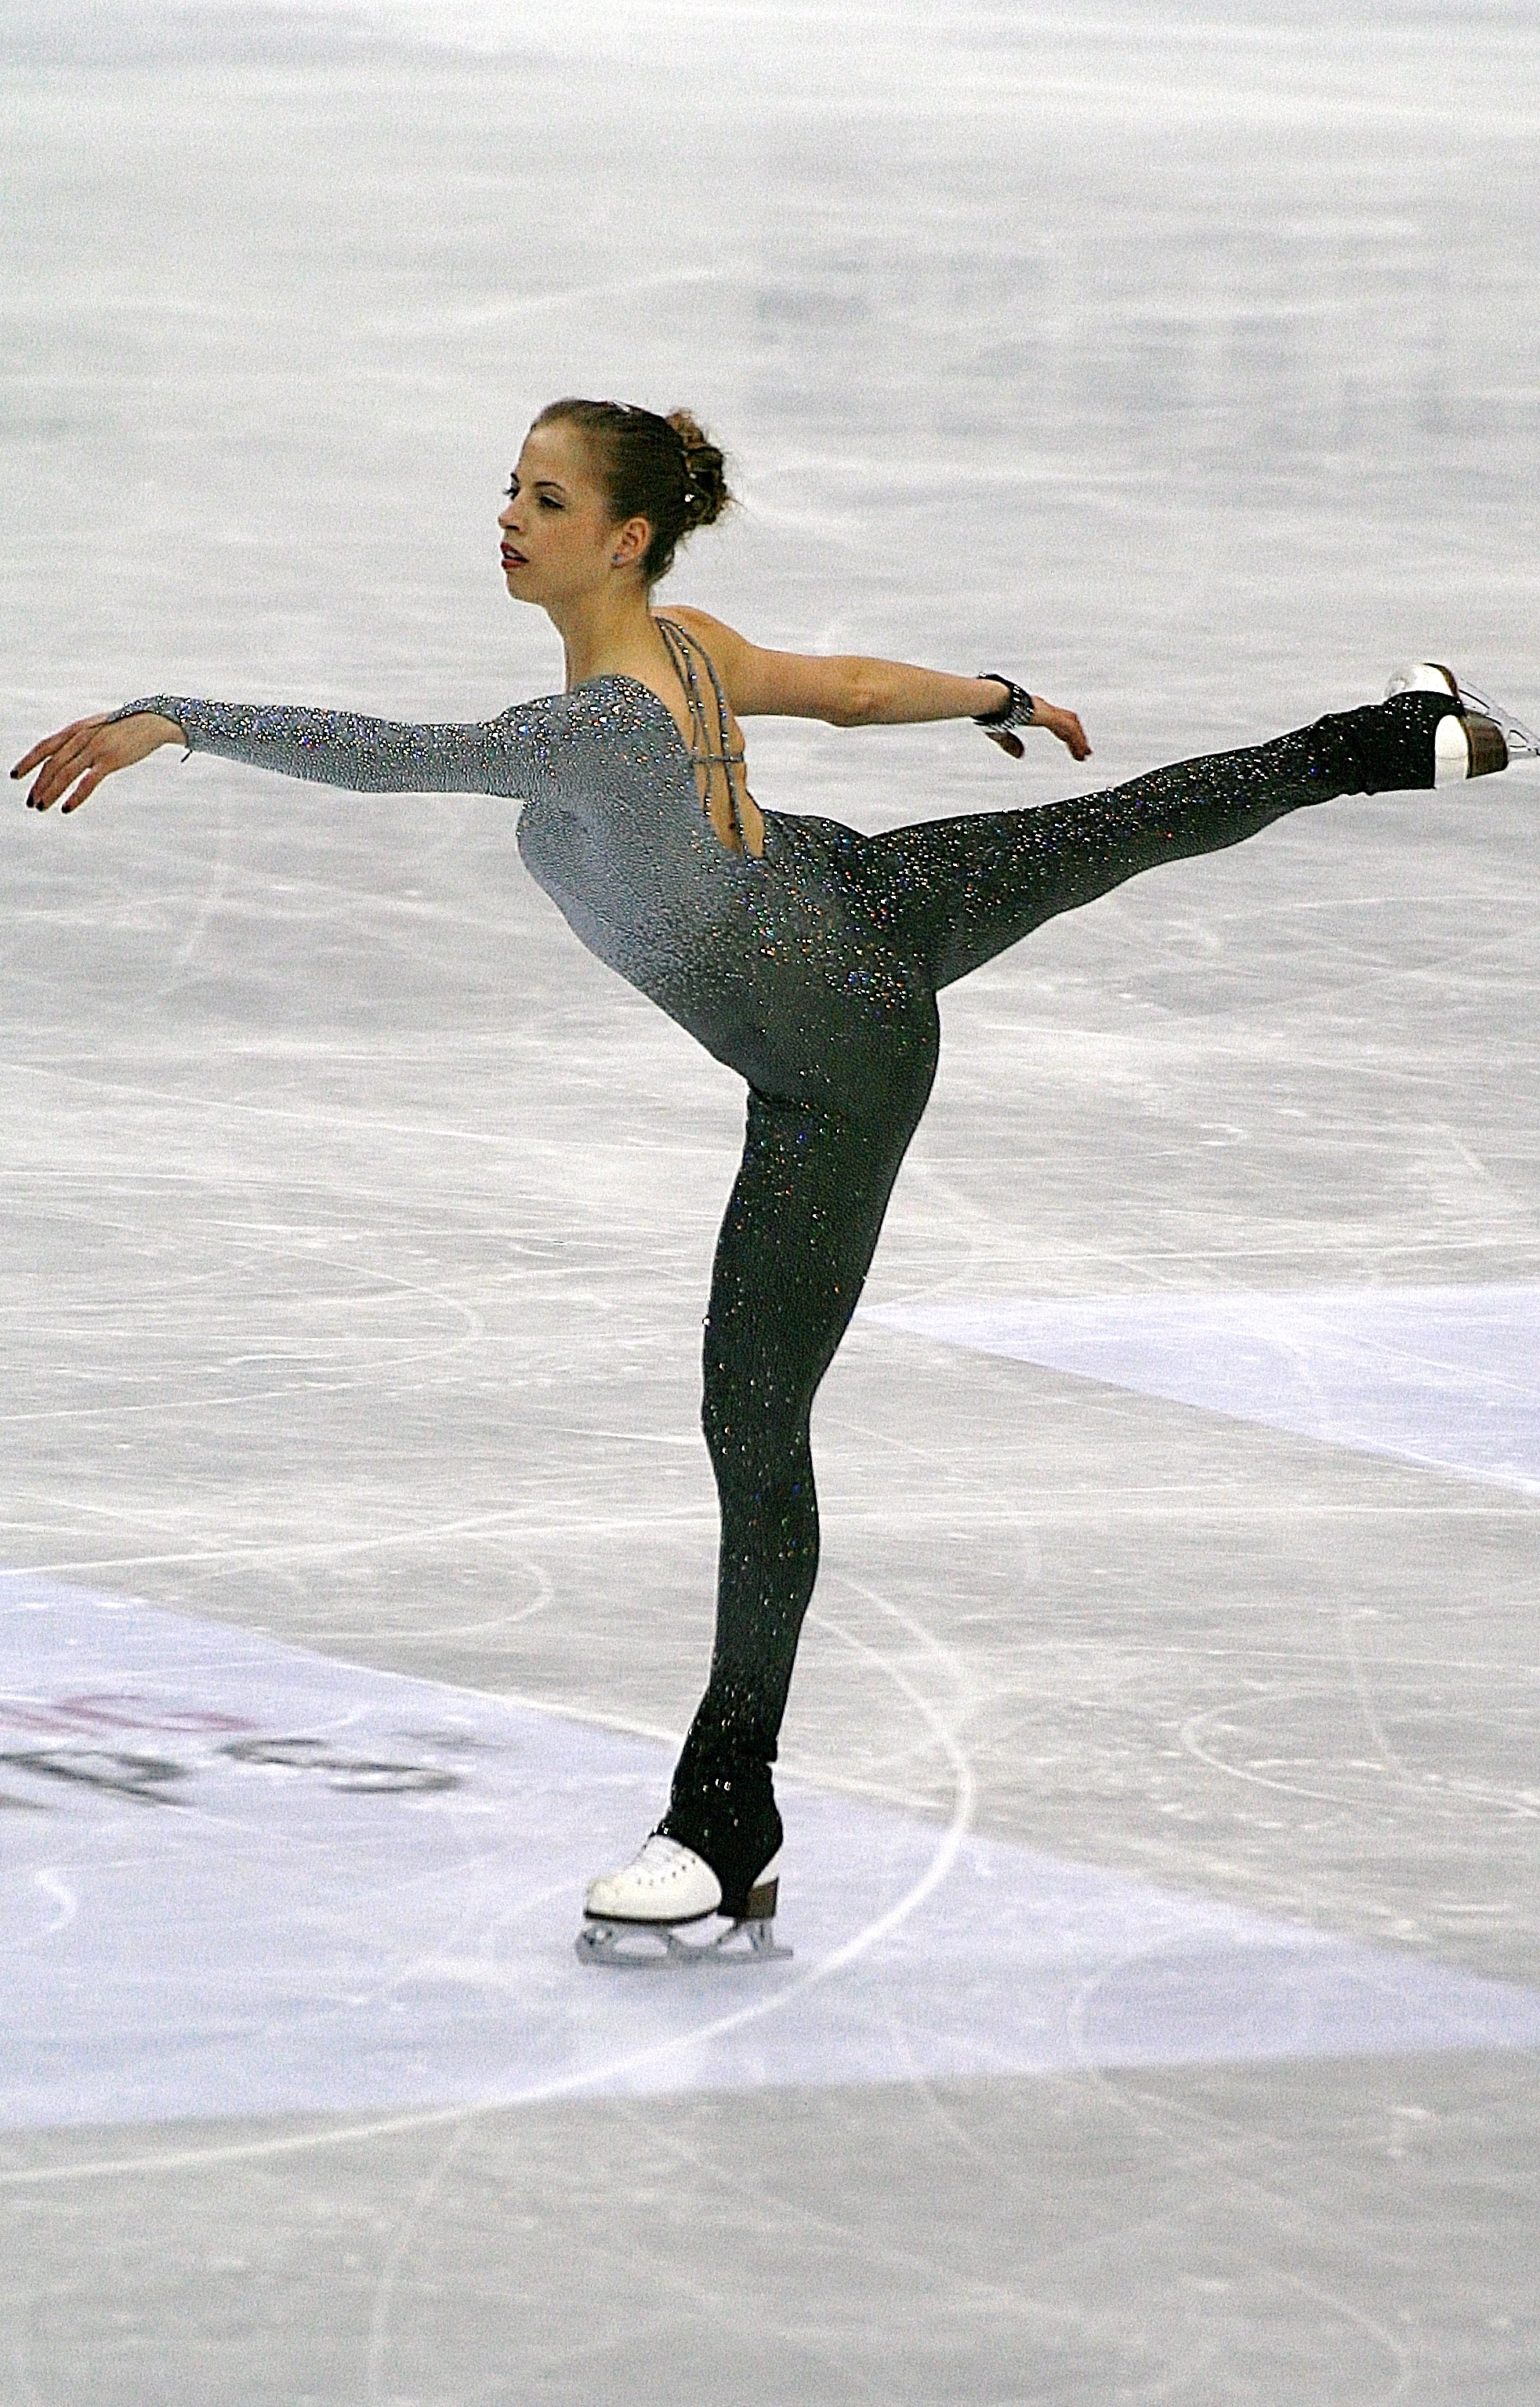 Carolina Kostner durante il programma libero ai mondiali 2012